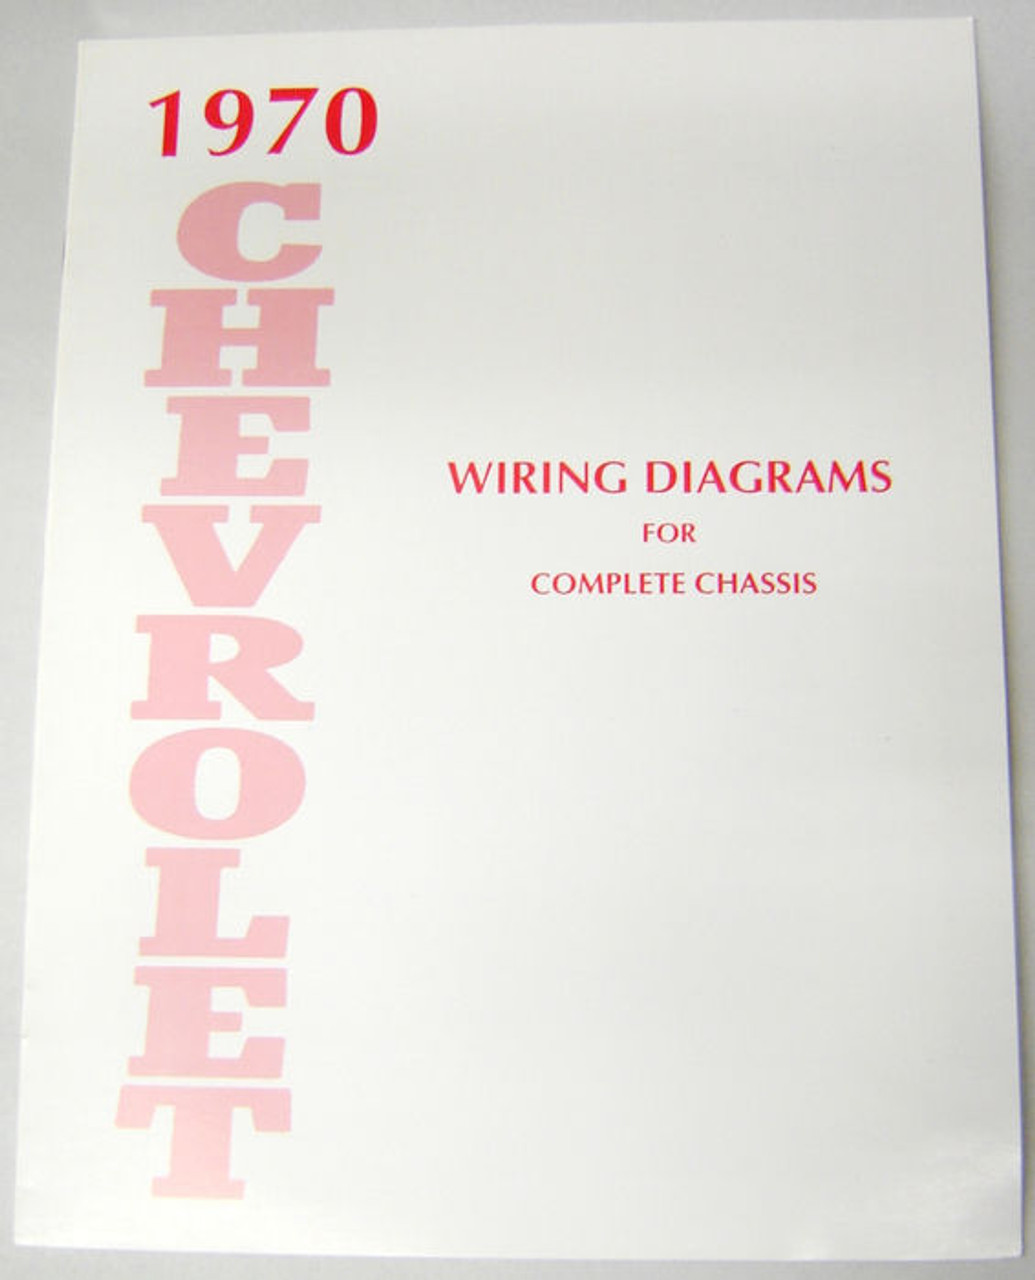 70 1970 chevy impala electrical wiring diagram manual i 5 classic rh i5chevy com 1970 chevrolet impala wiring diagram Avenger UTV 150 Wiring Diagram